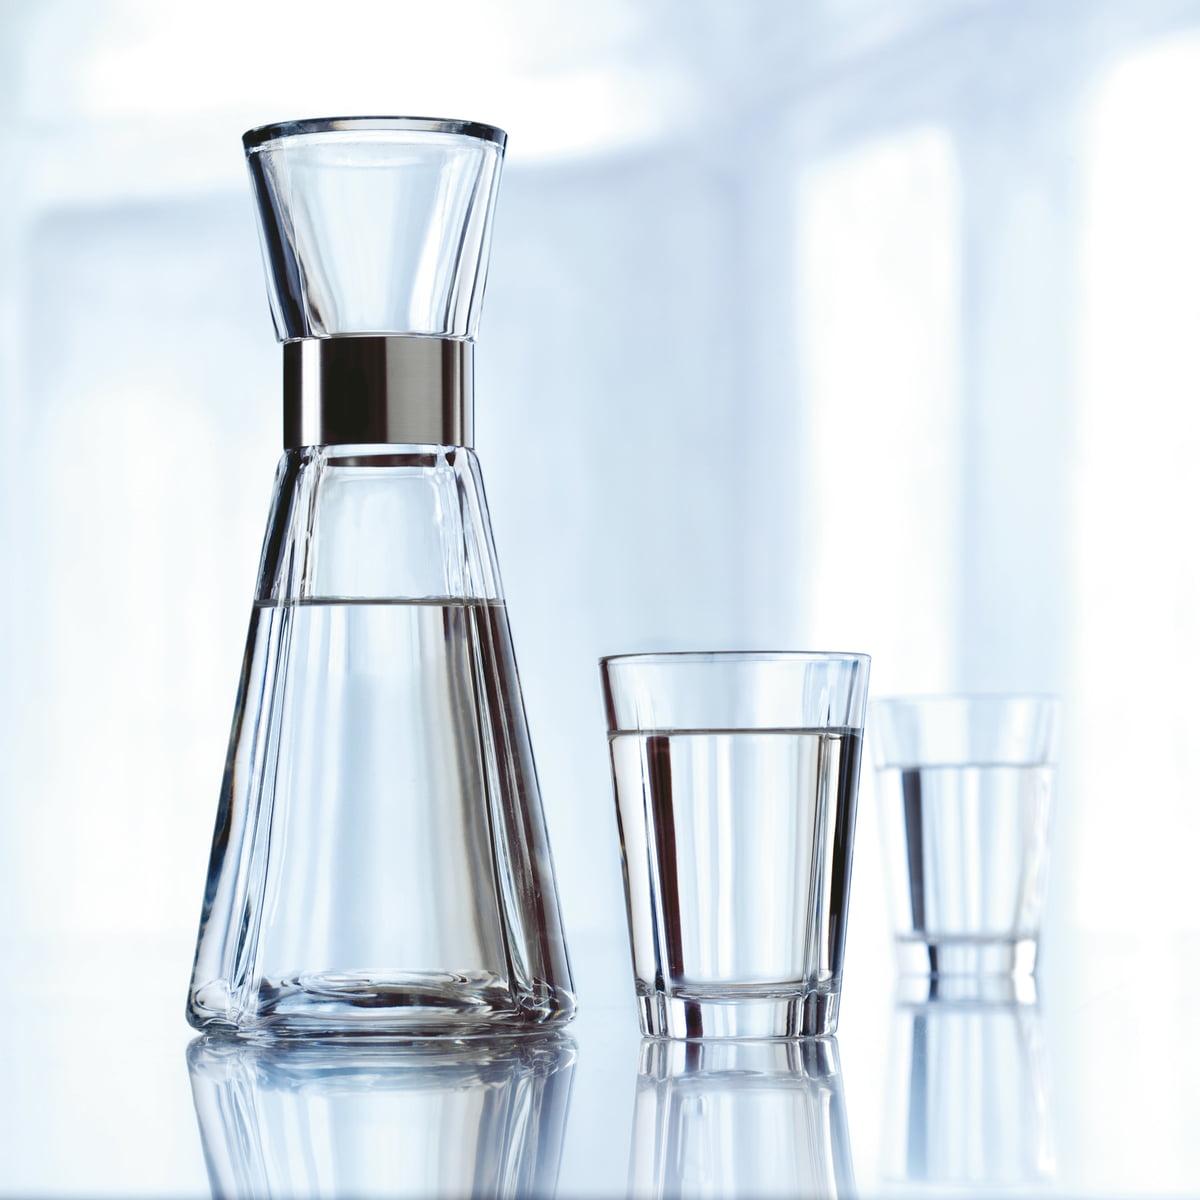 rosendahl grand cru water carafe  glasses - rosendahl  grand cru water carafe